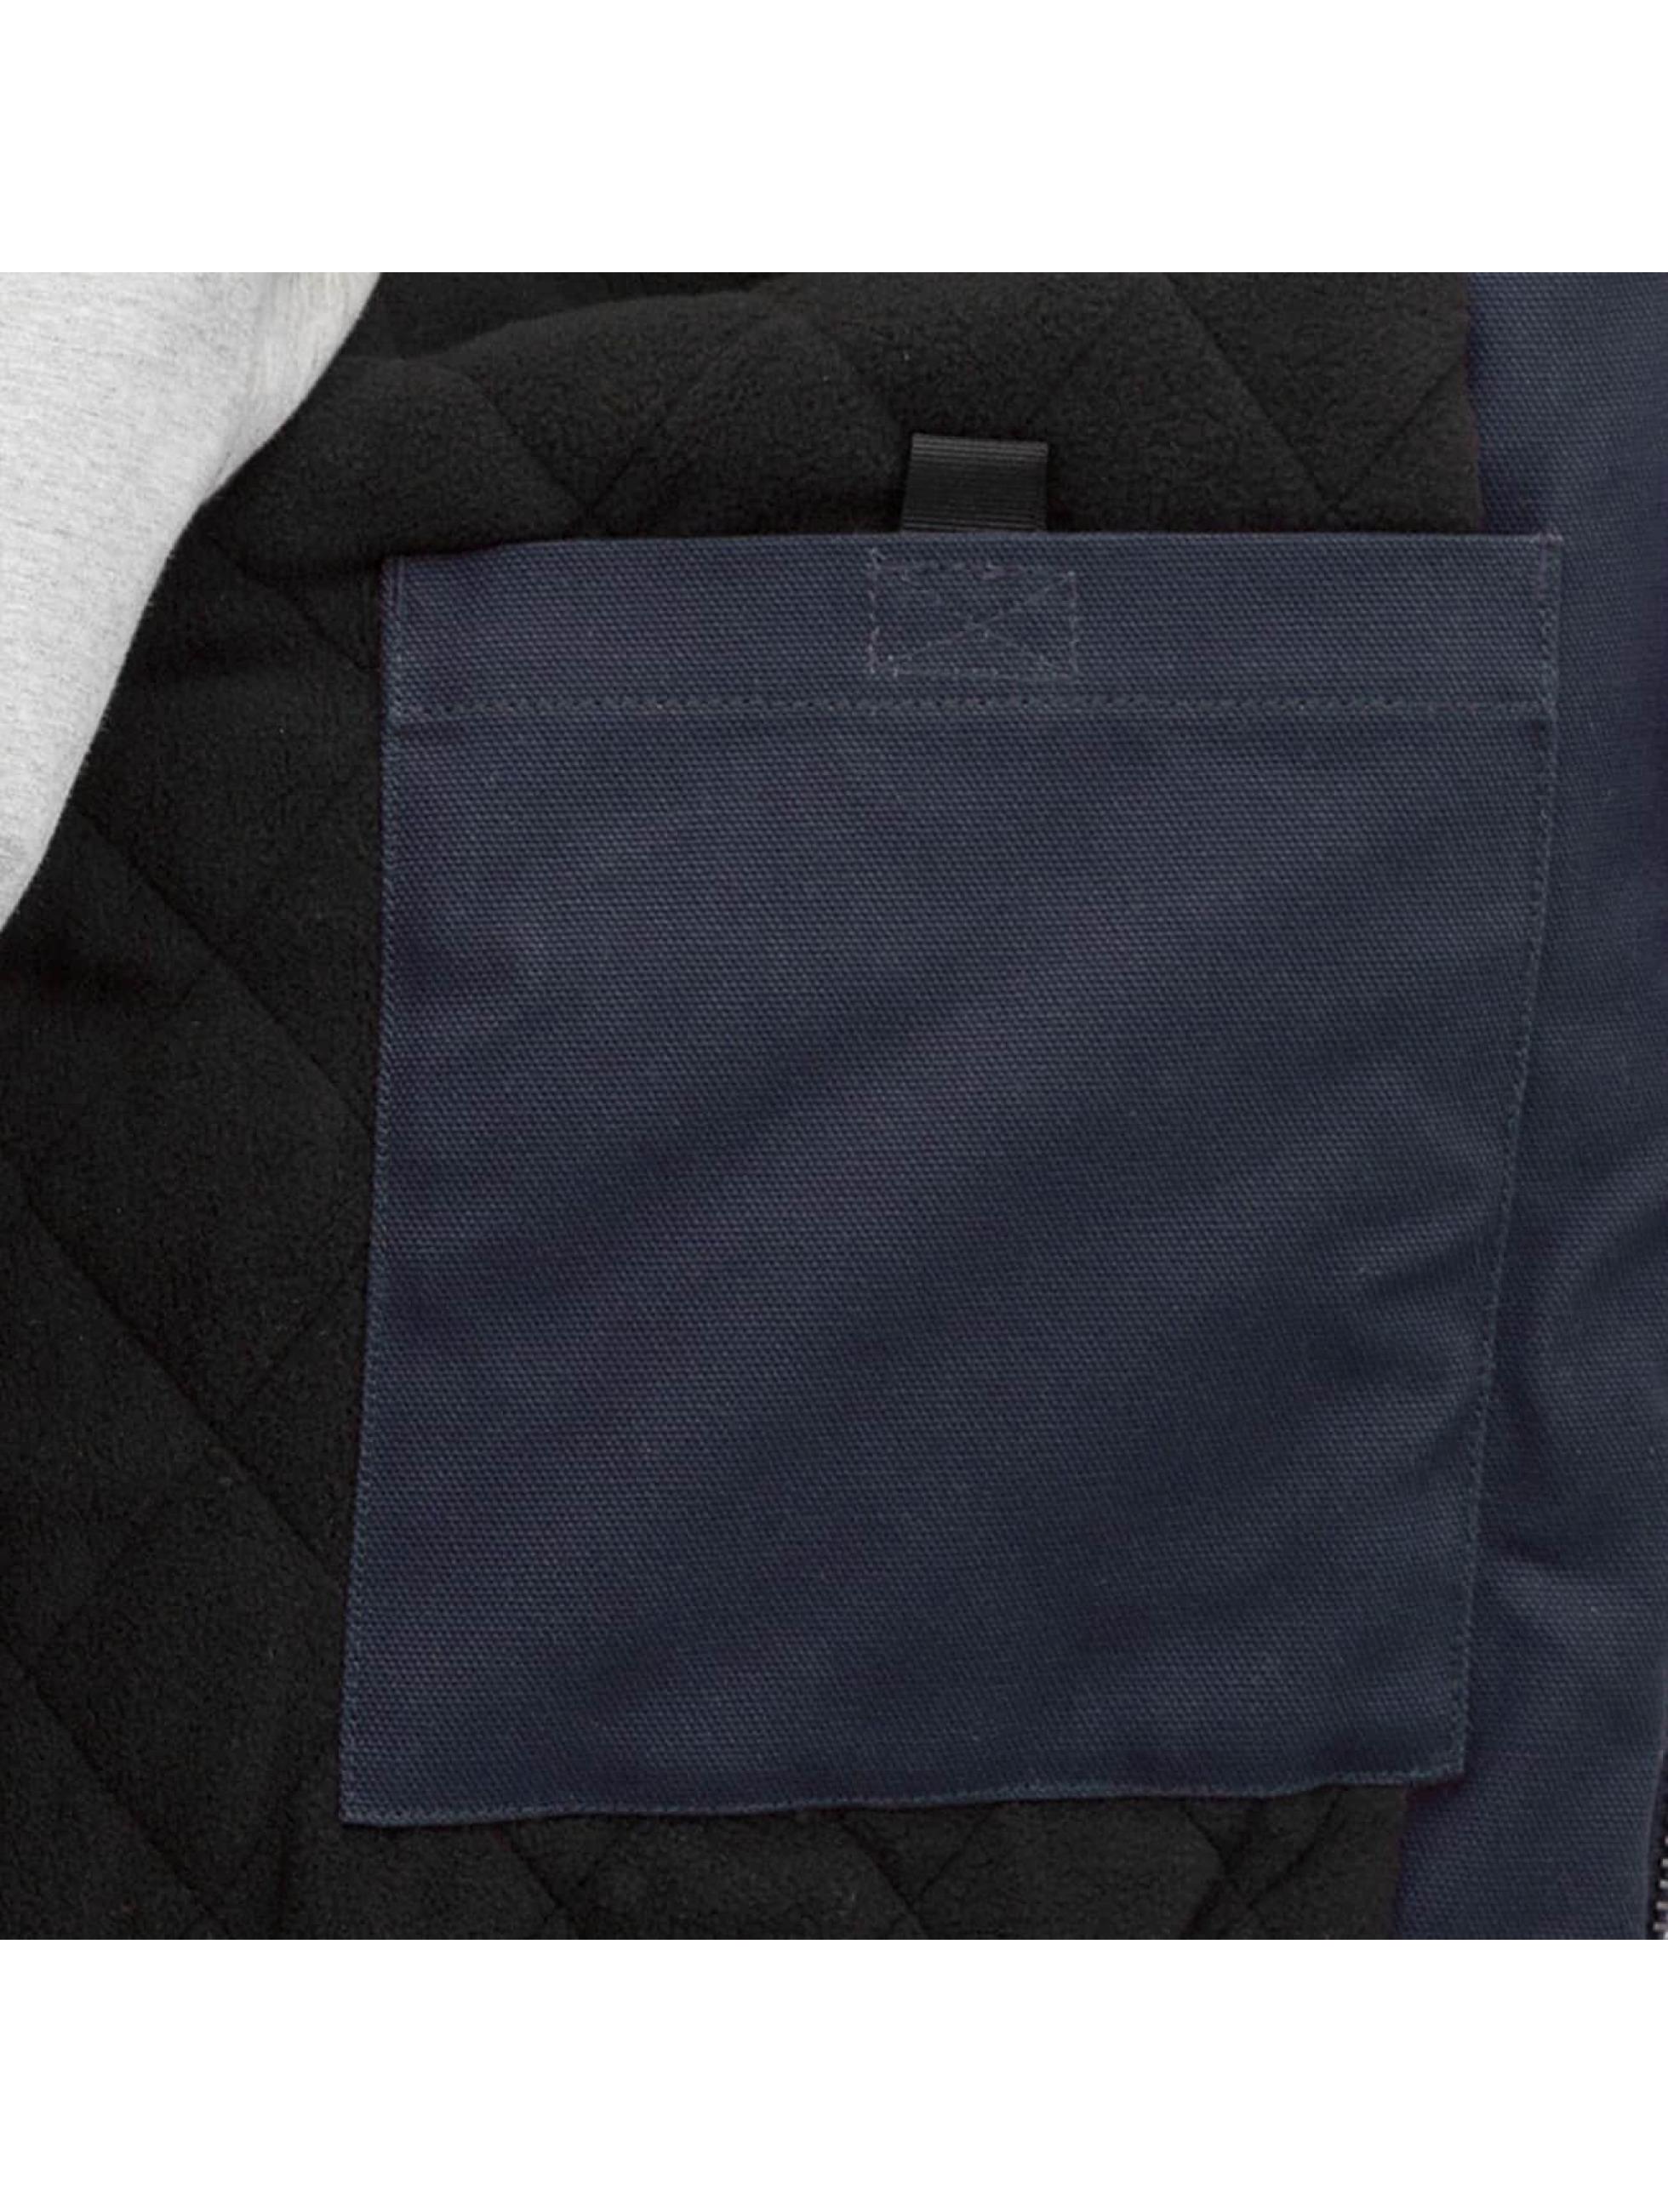 Carhartt WIP Winterjacke Dearborn Canvas Active blau